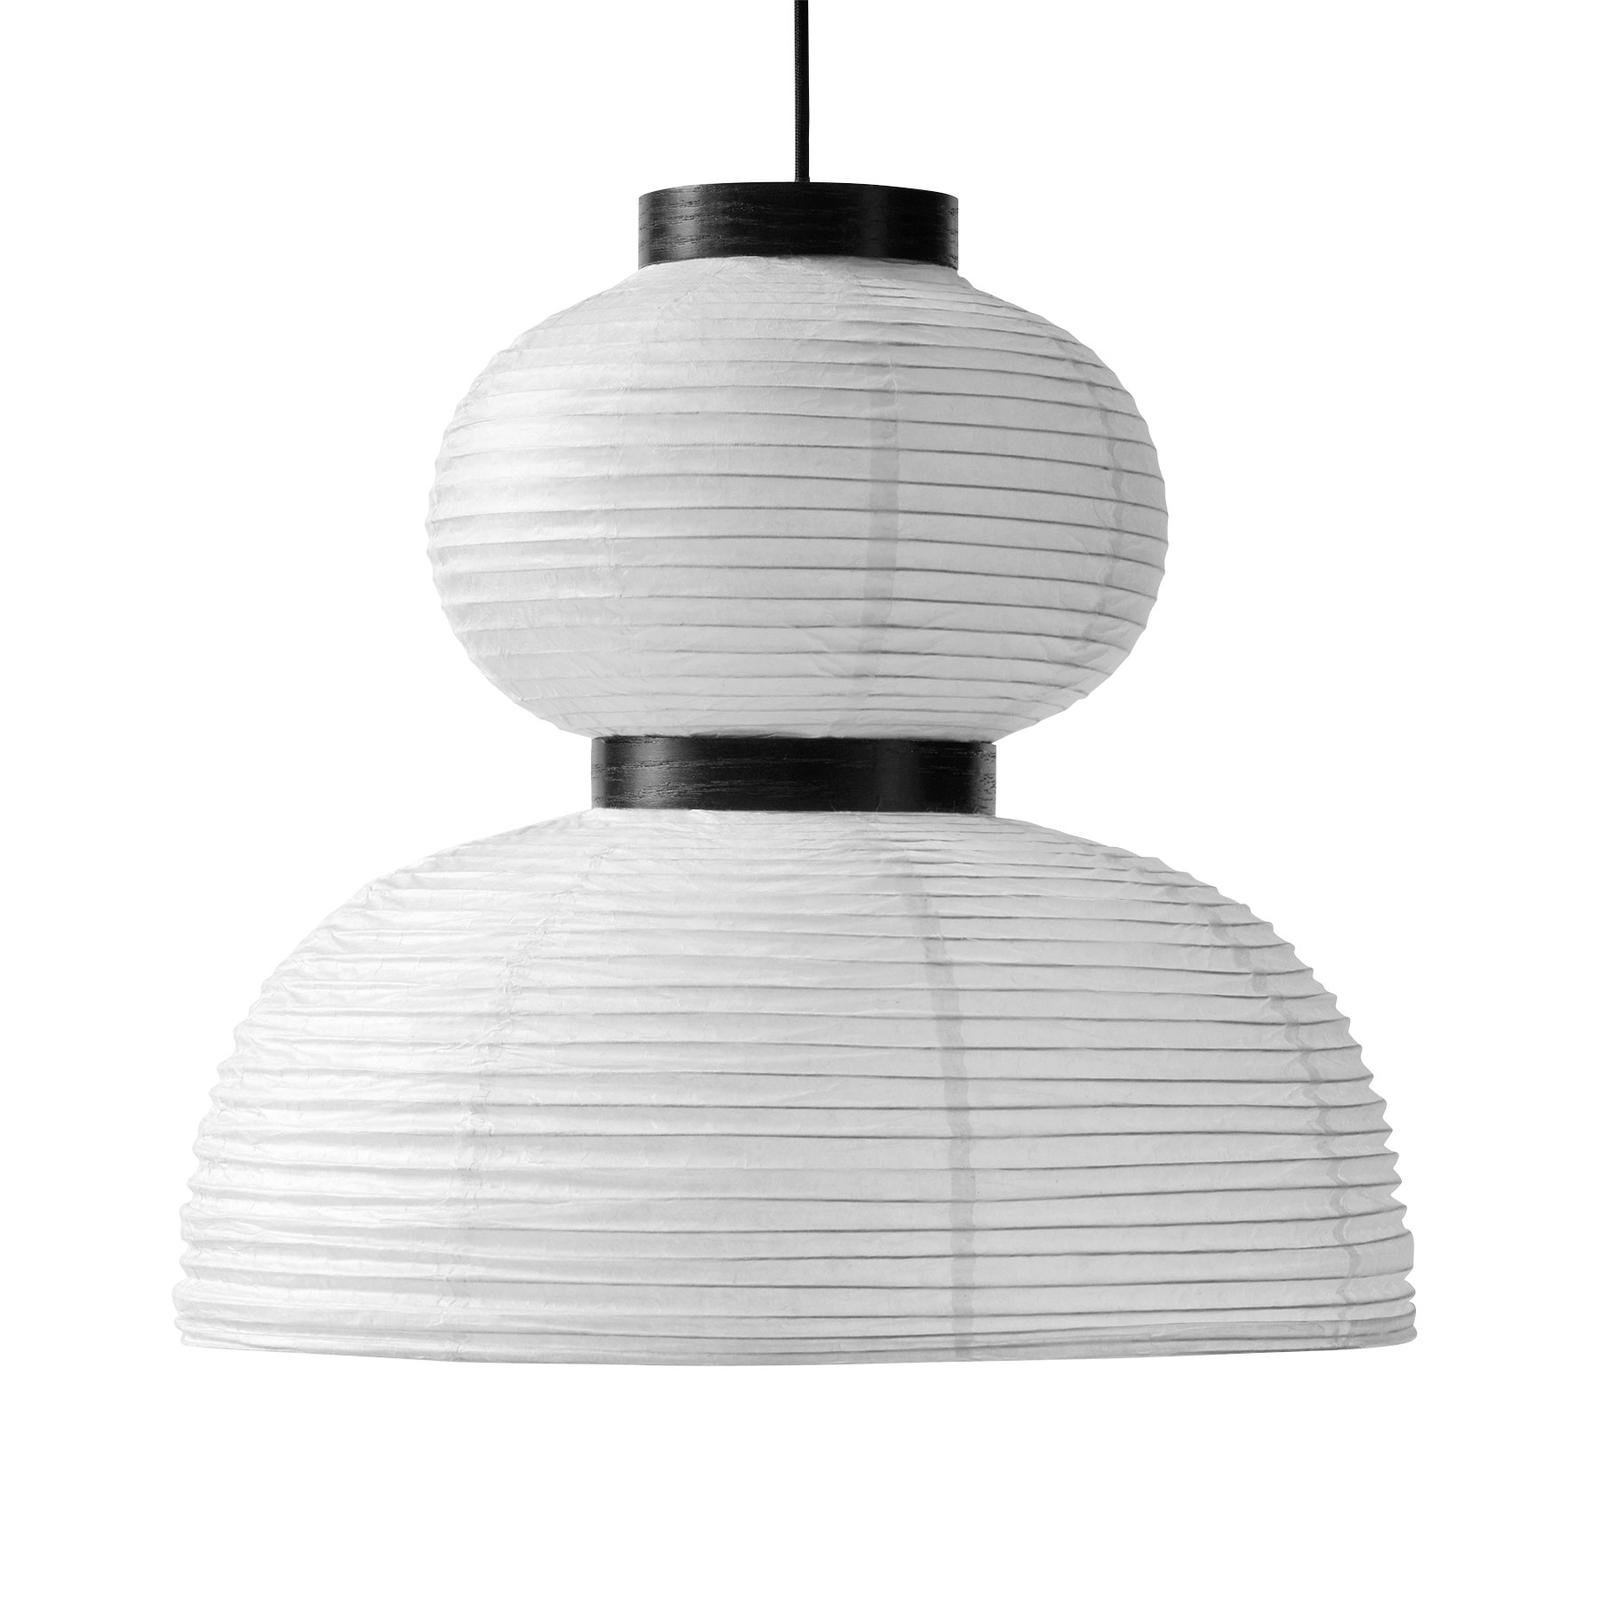 &Tradition Formakami JH4 hængelampe